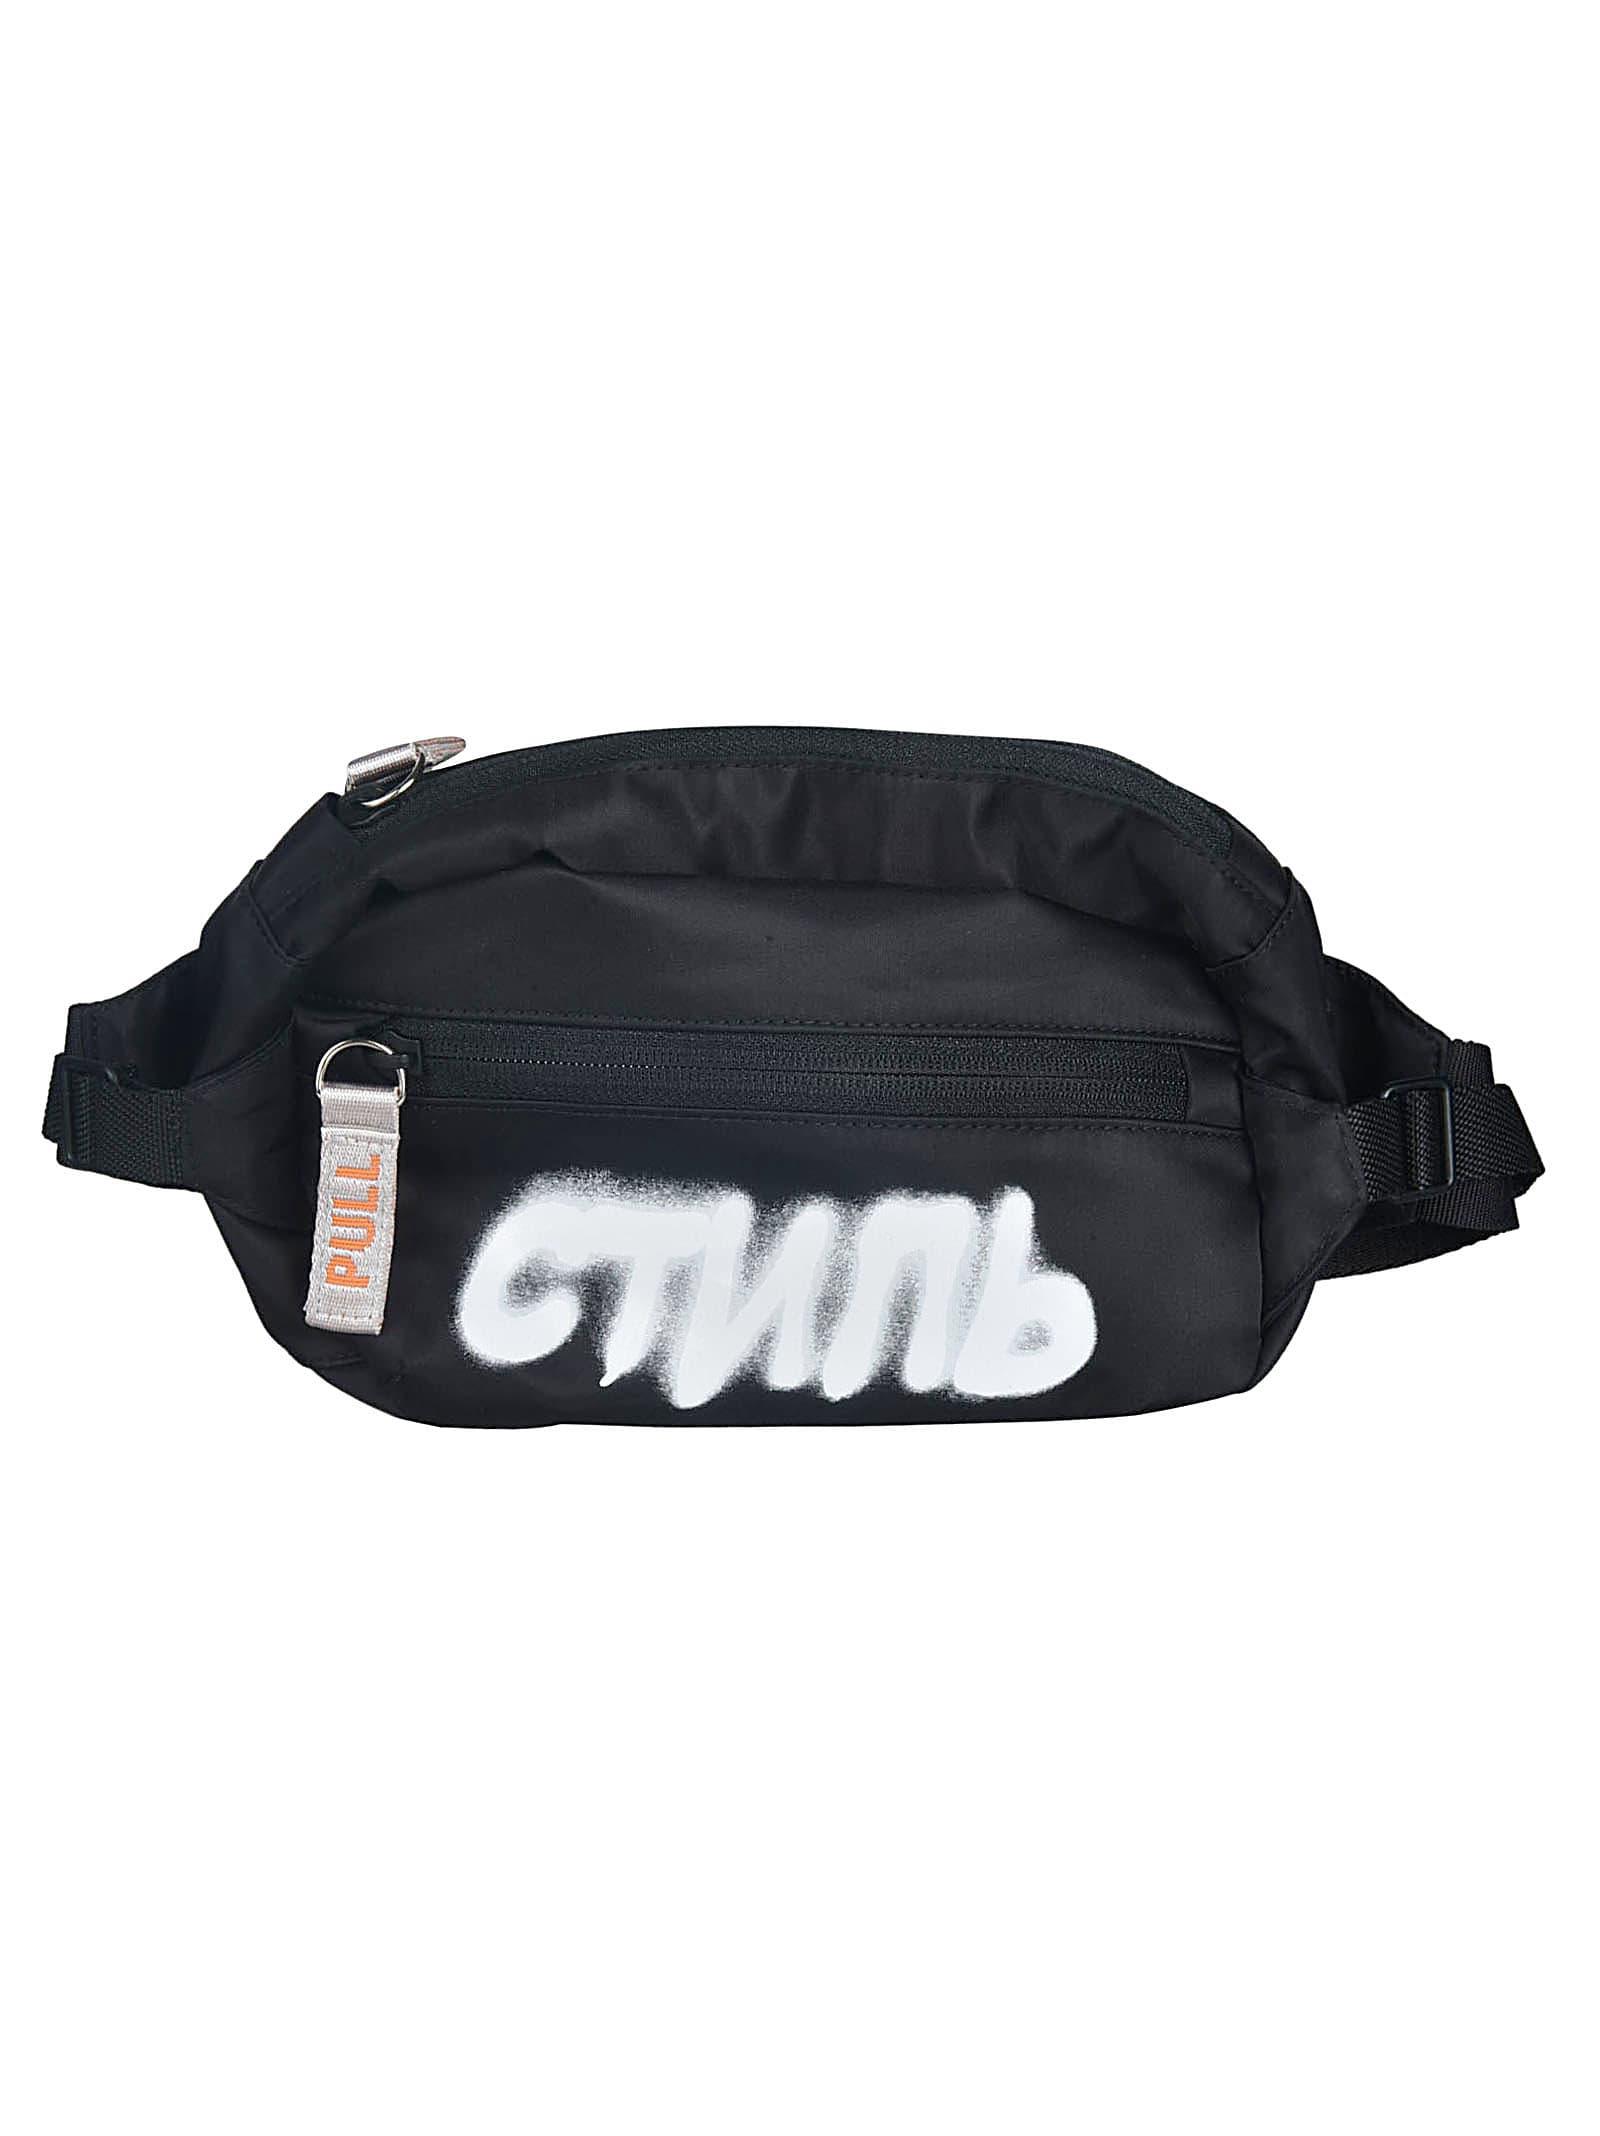 HERON PRESTON Spray Logo Belt Bag